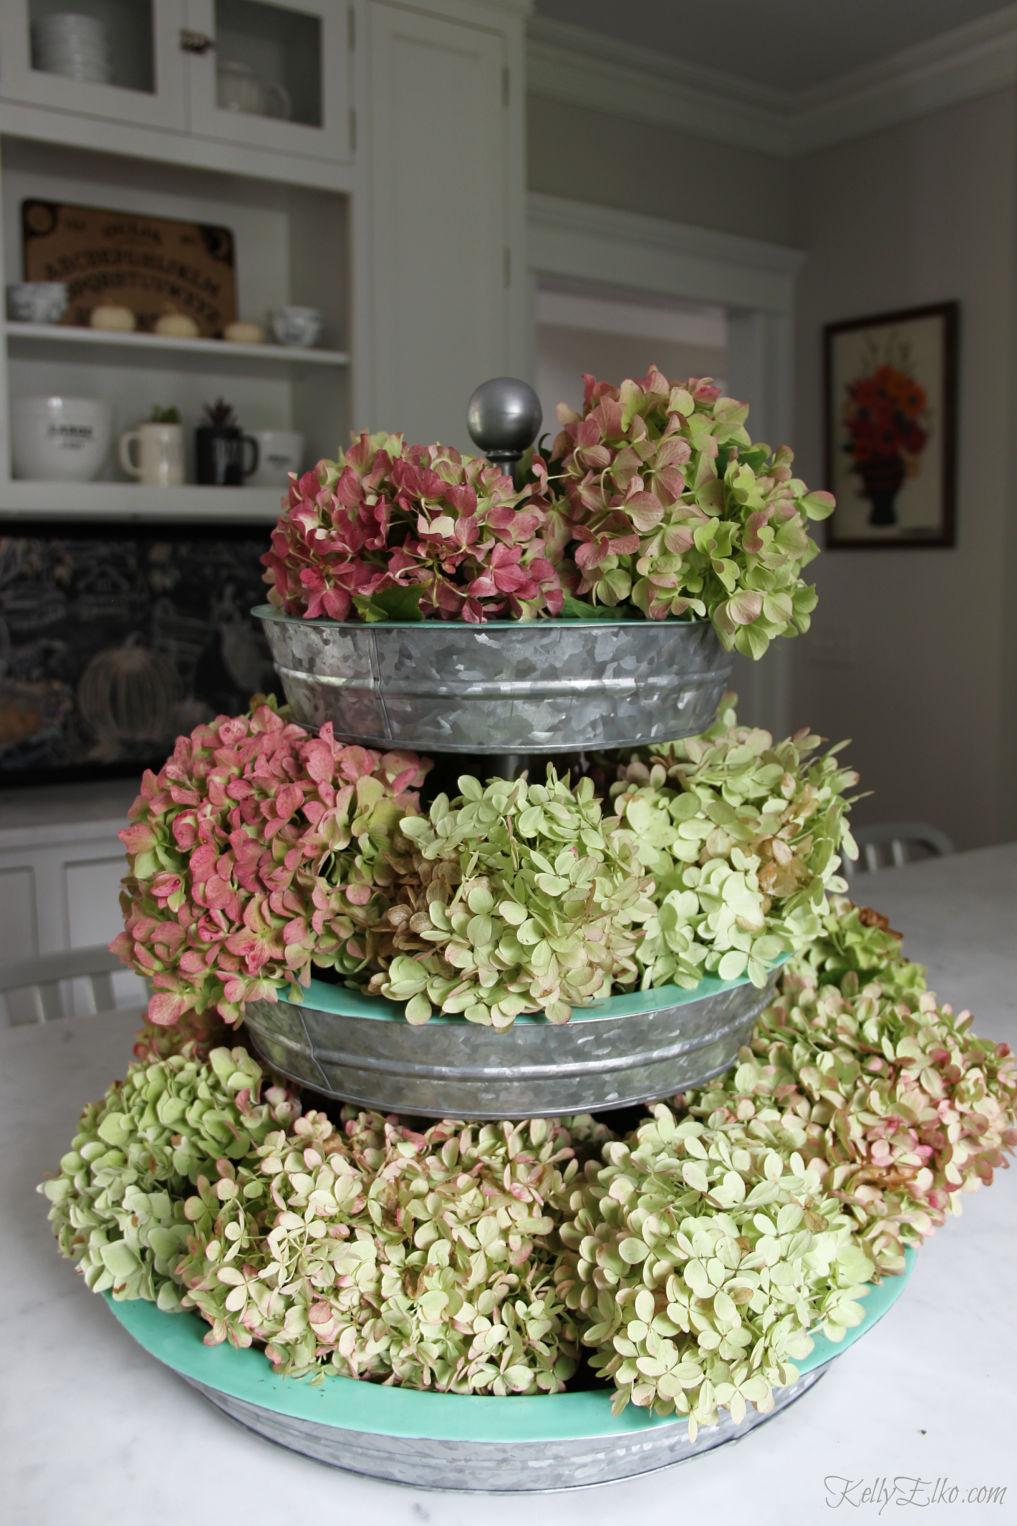 Fall home tour - love this beautiful tiered tray displaying fall hydrangeas kellyelko.com #hydrangeas #fall #falldecor #tieredtray #kitchendecor